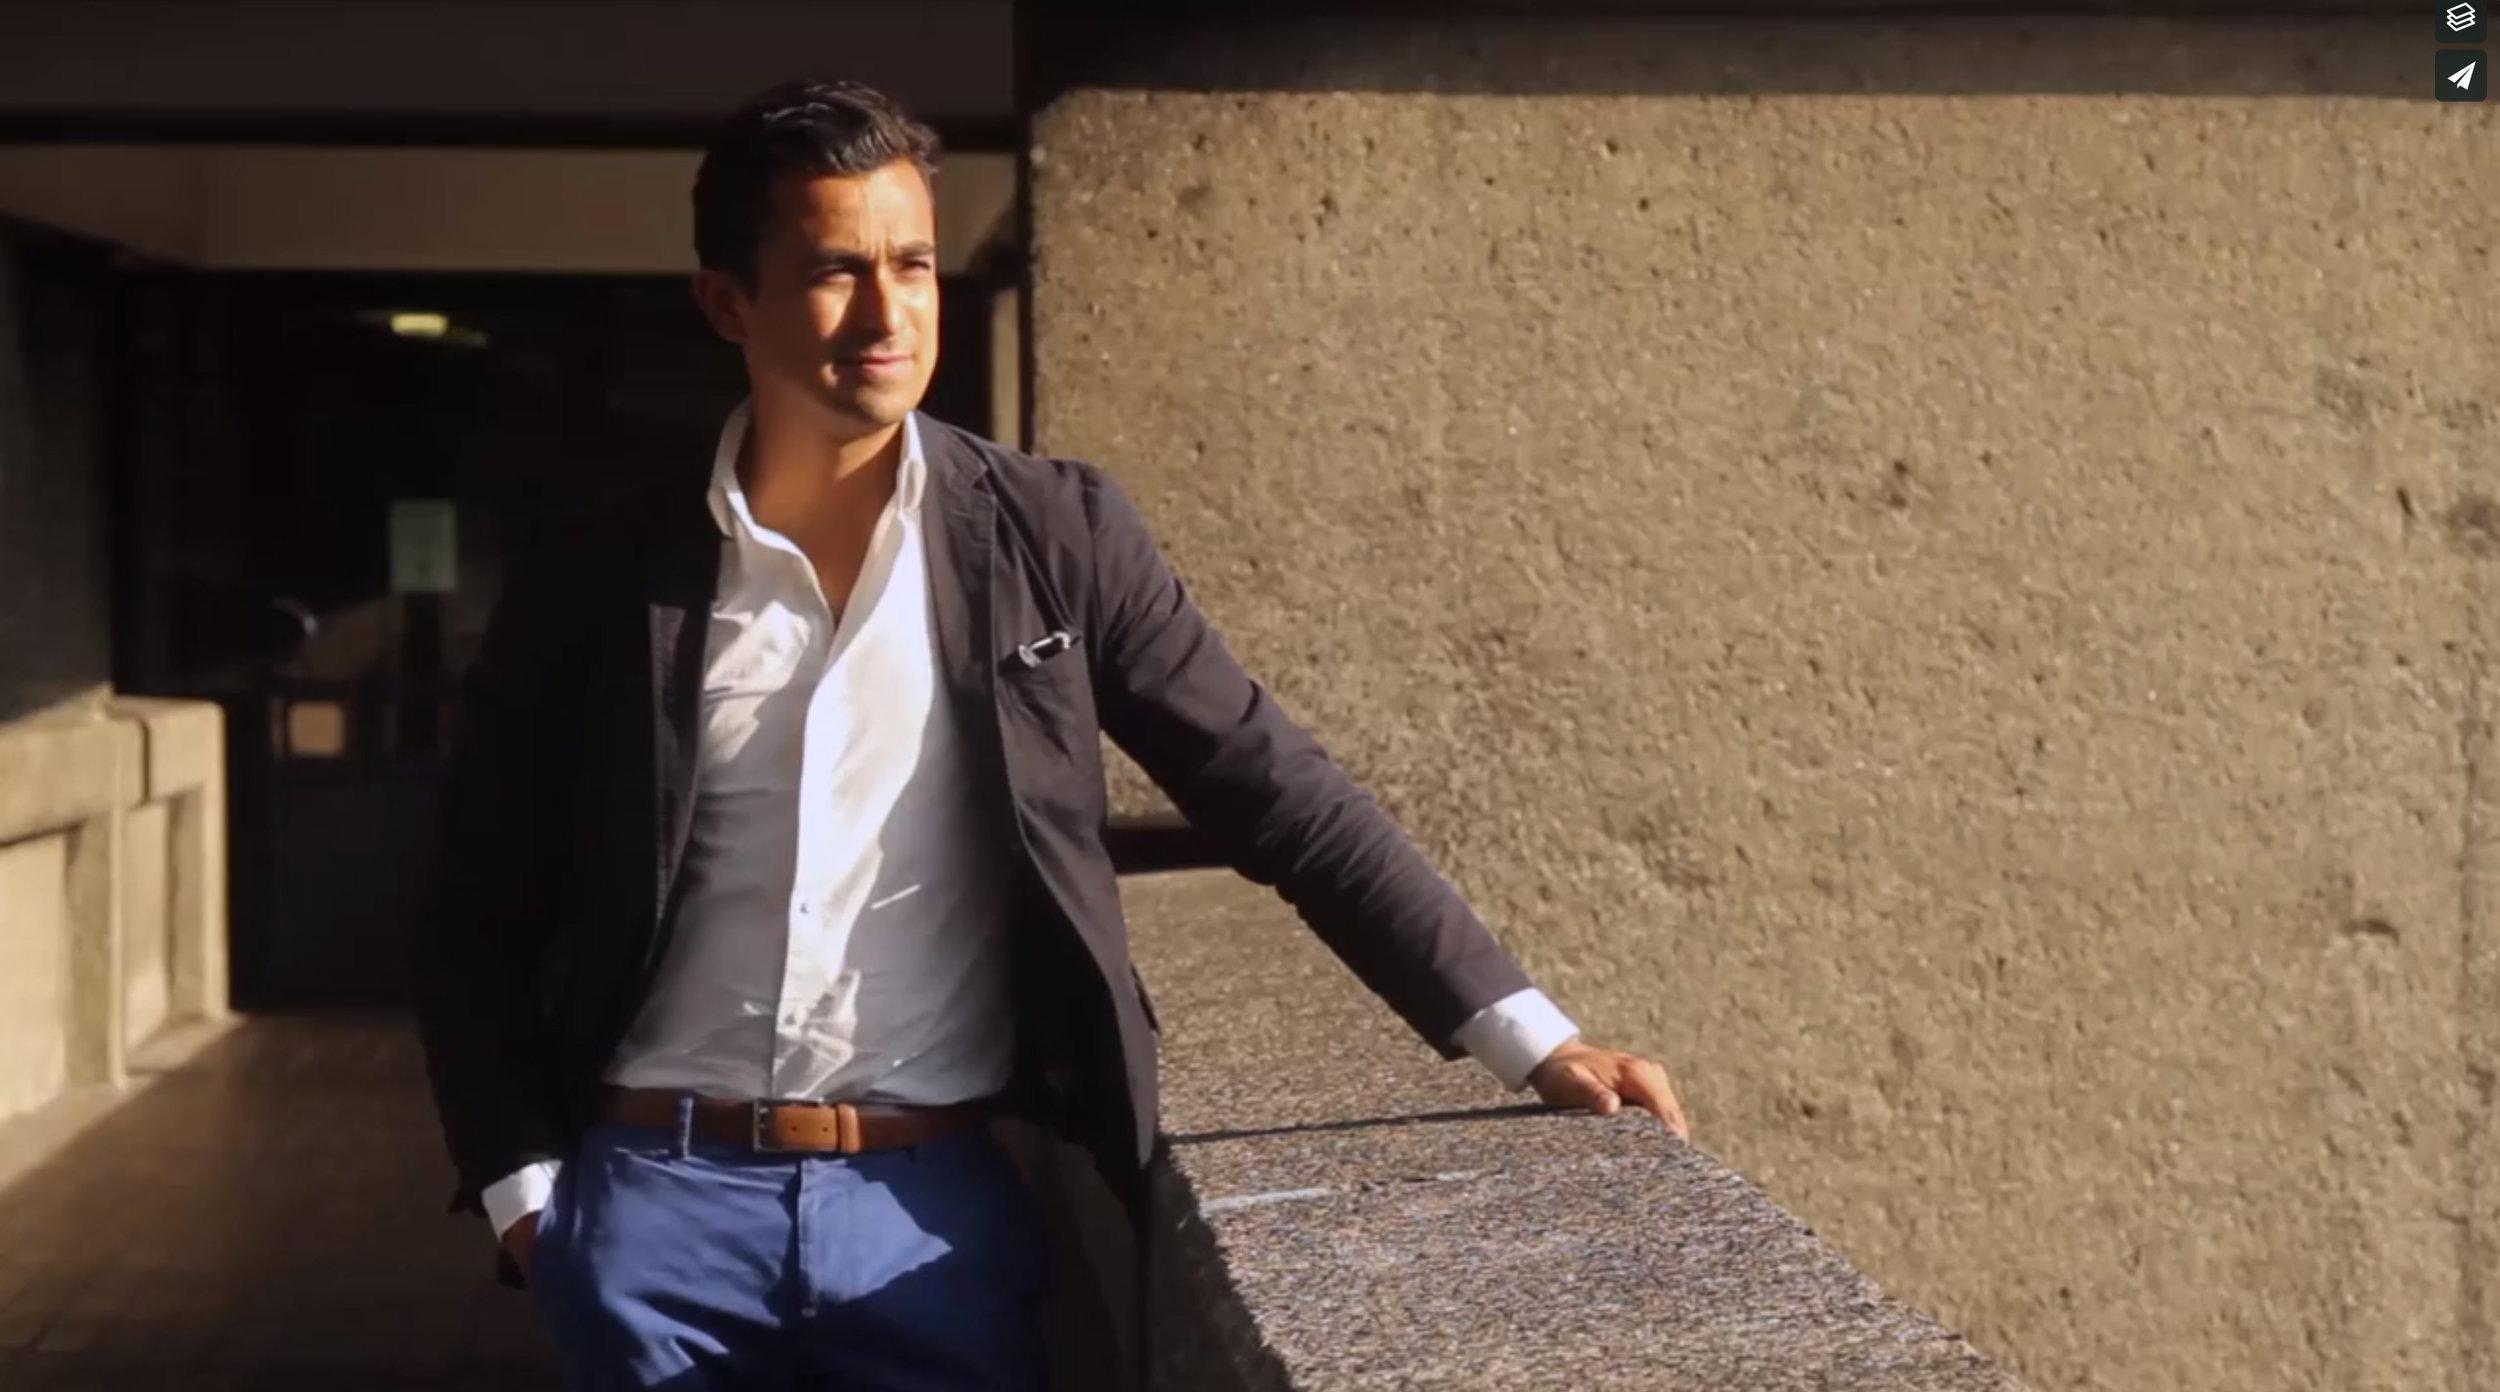 Marco Ortiz RIBA ARB, Design Director